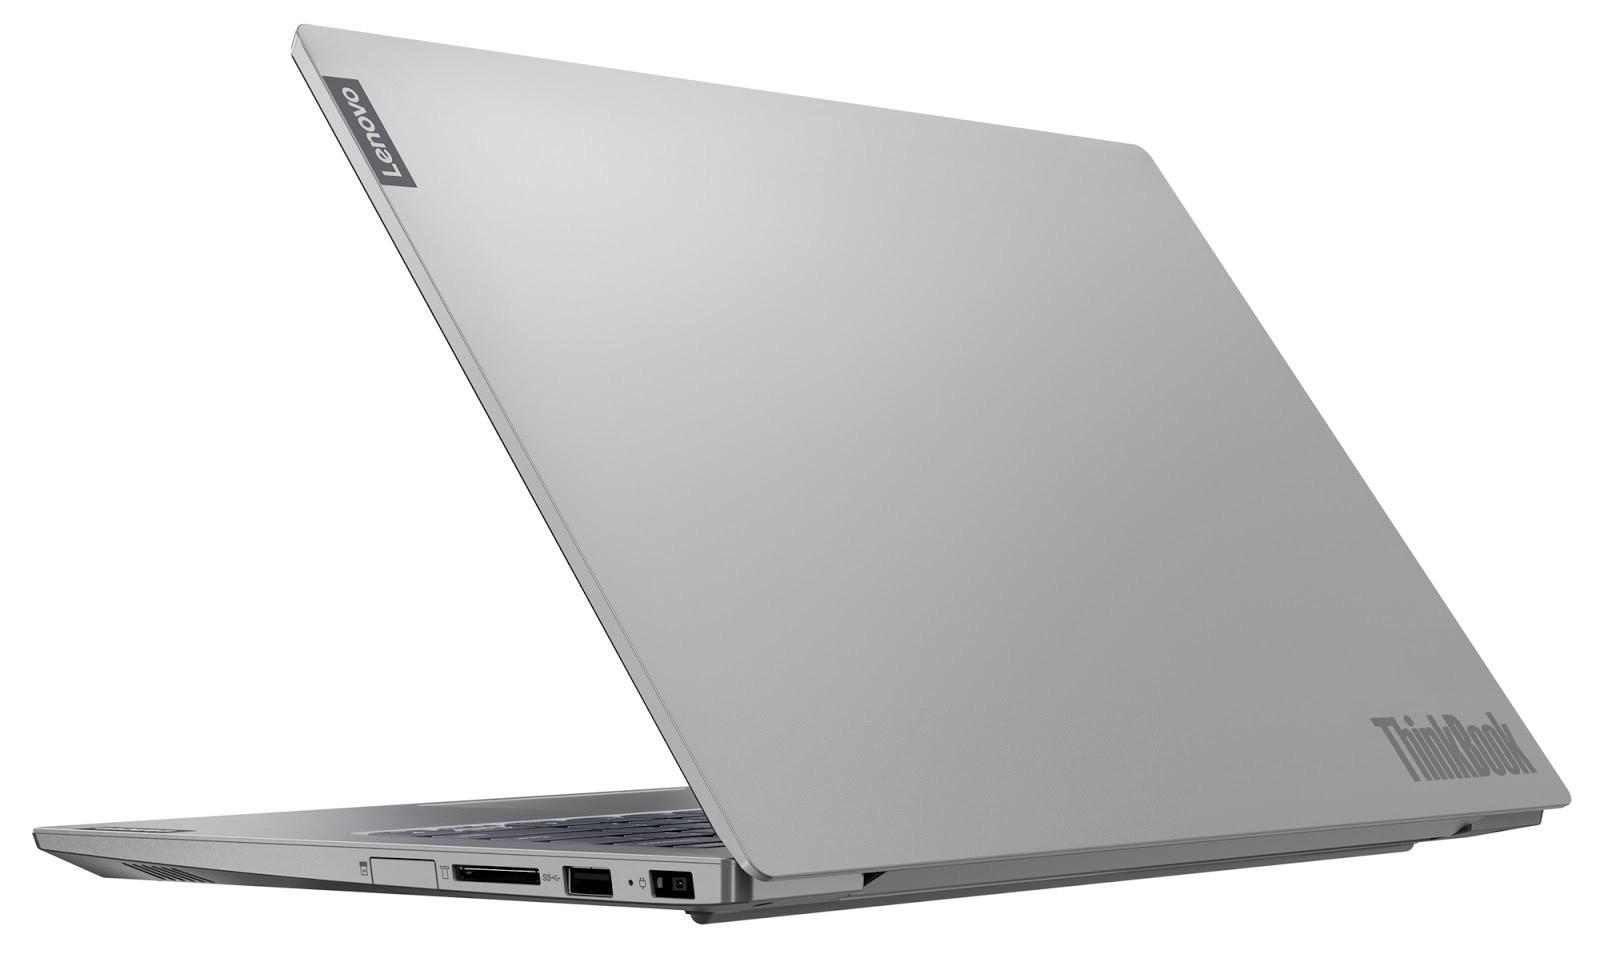 Фото 2. Ноутбук Lenovo ThinkBook 14 IIL (20SL00P1RU)